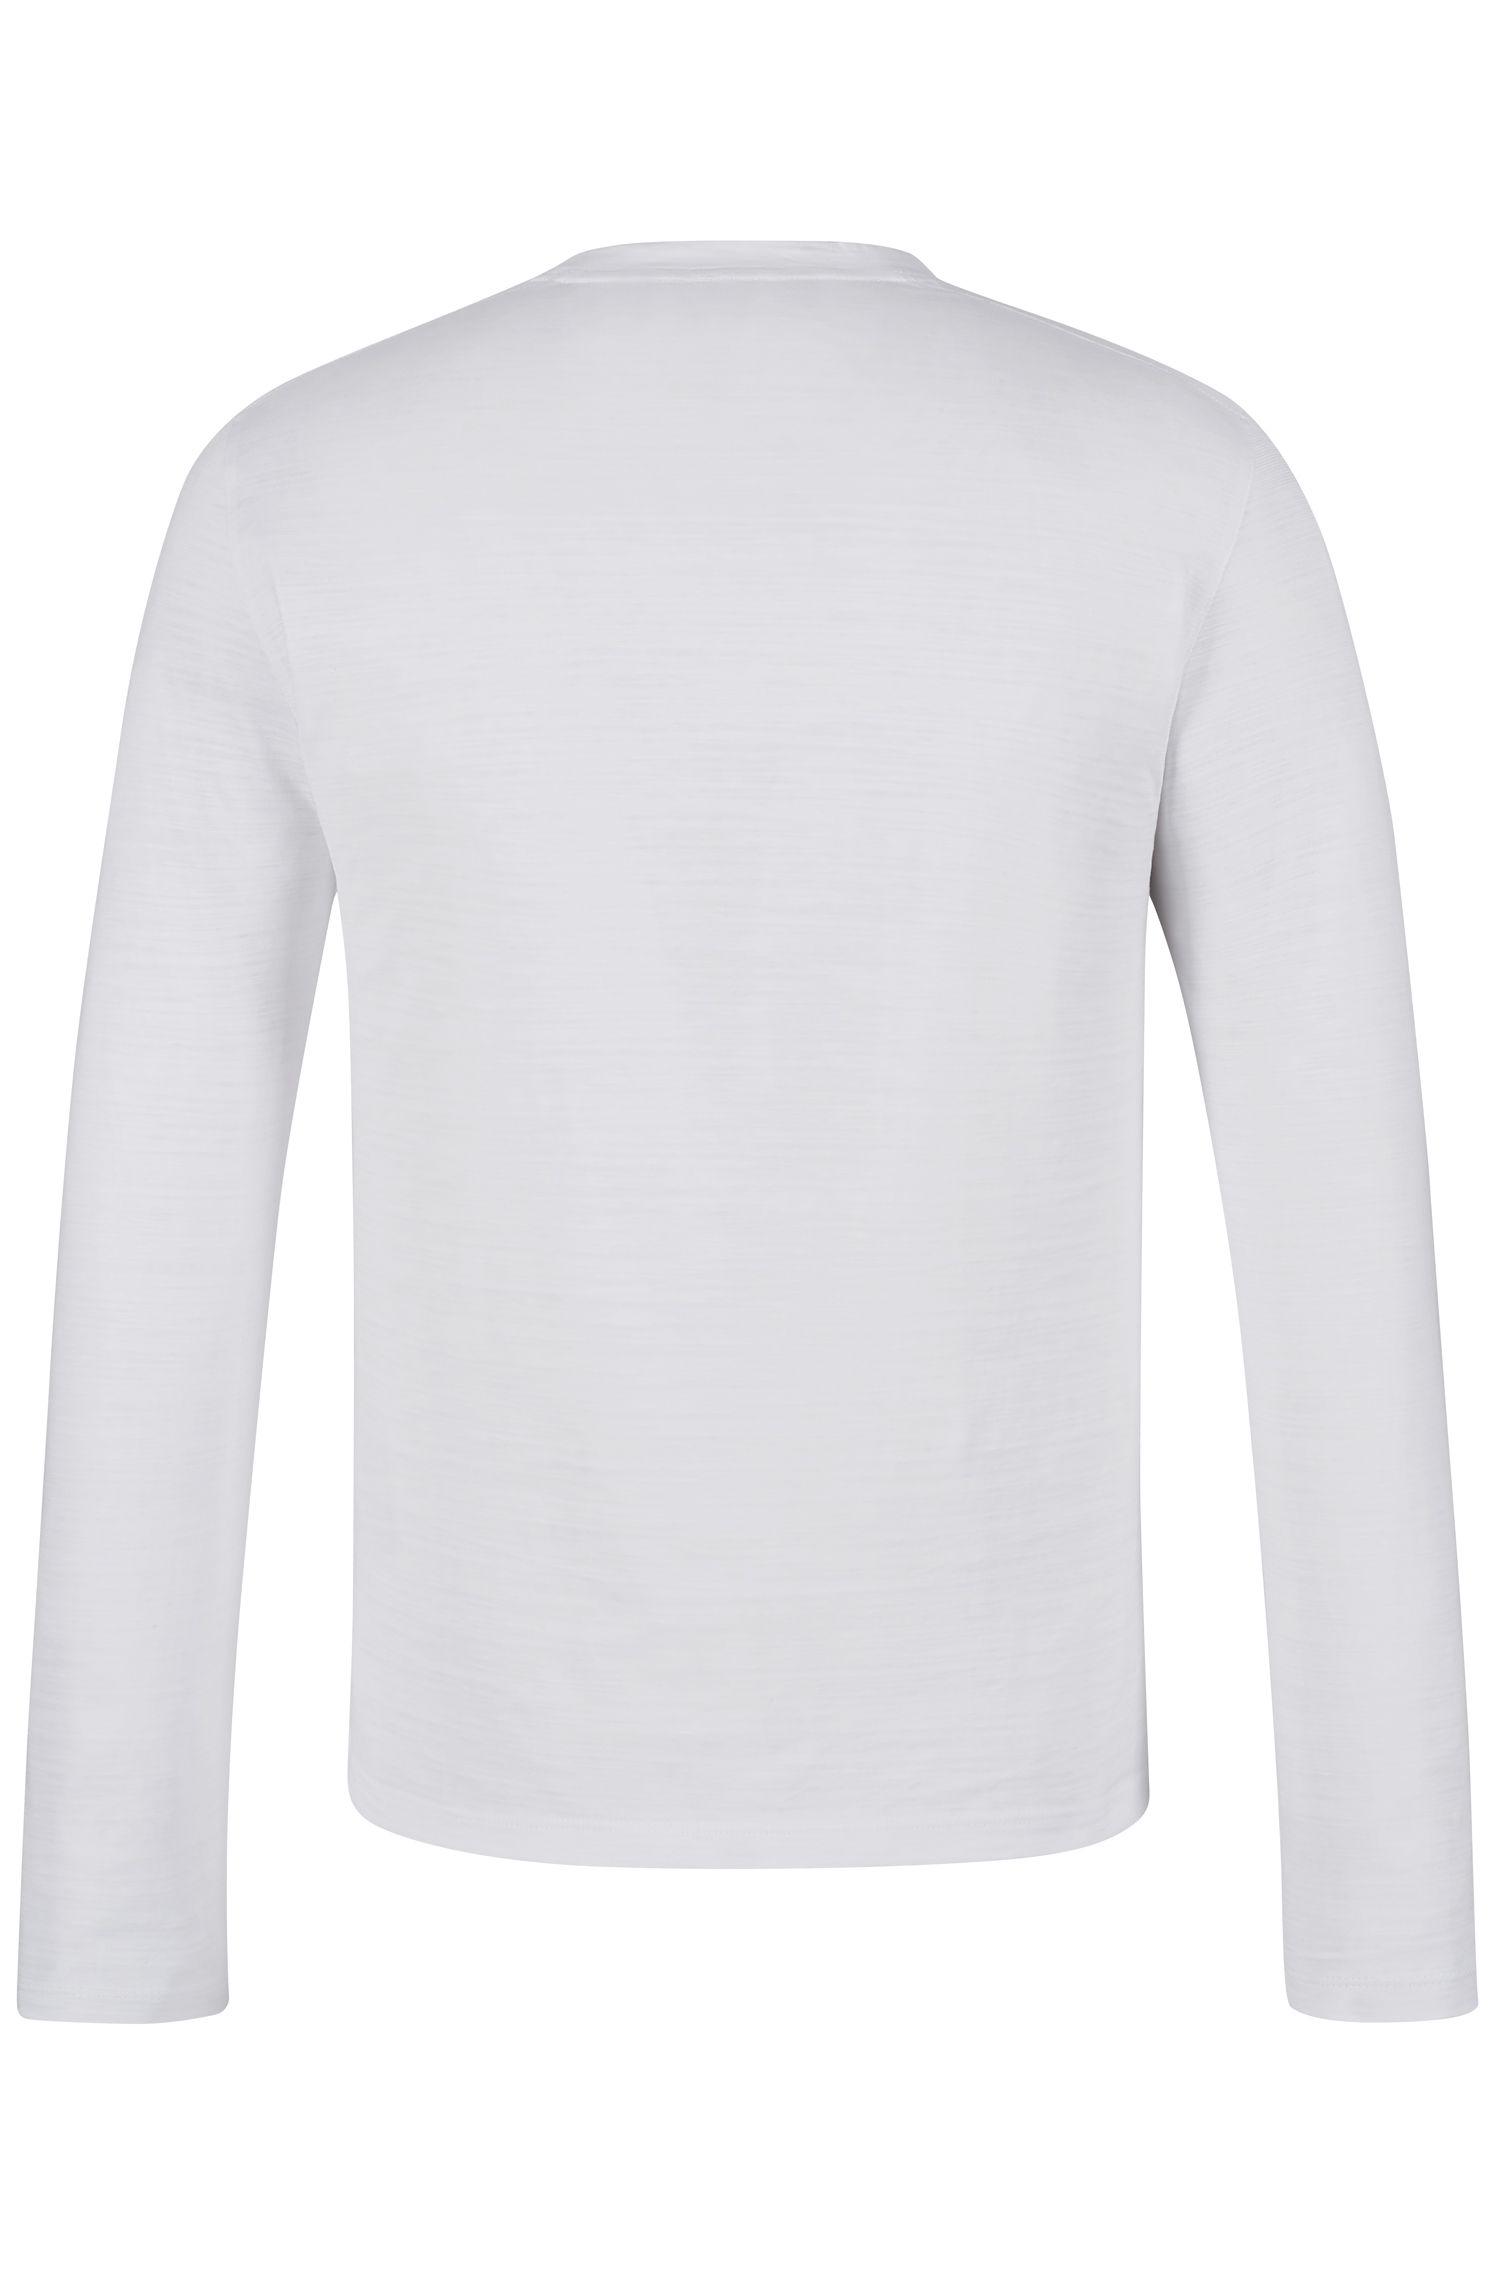 Cotton T-Shirt | Tenison, White